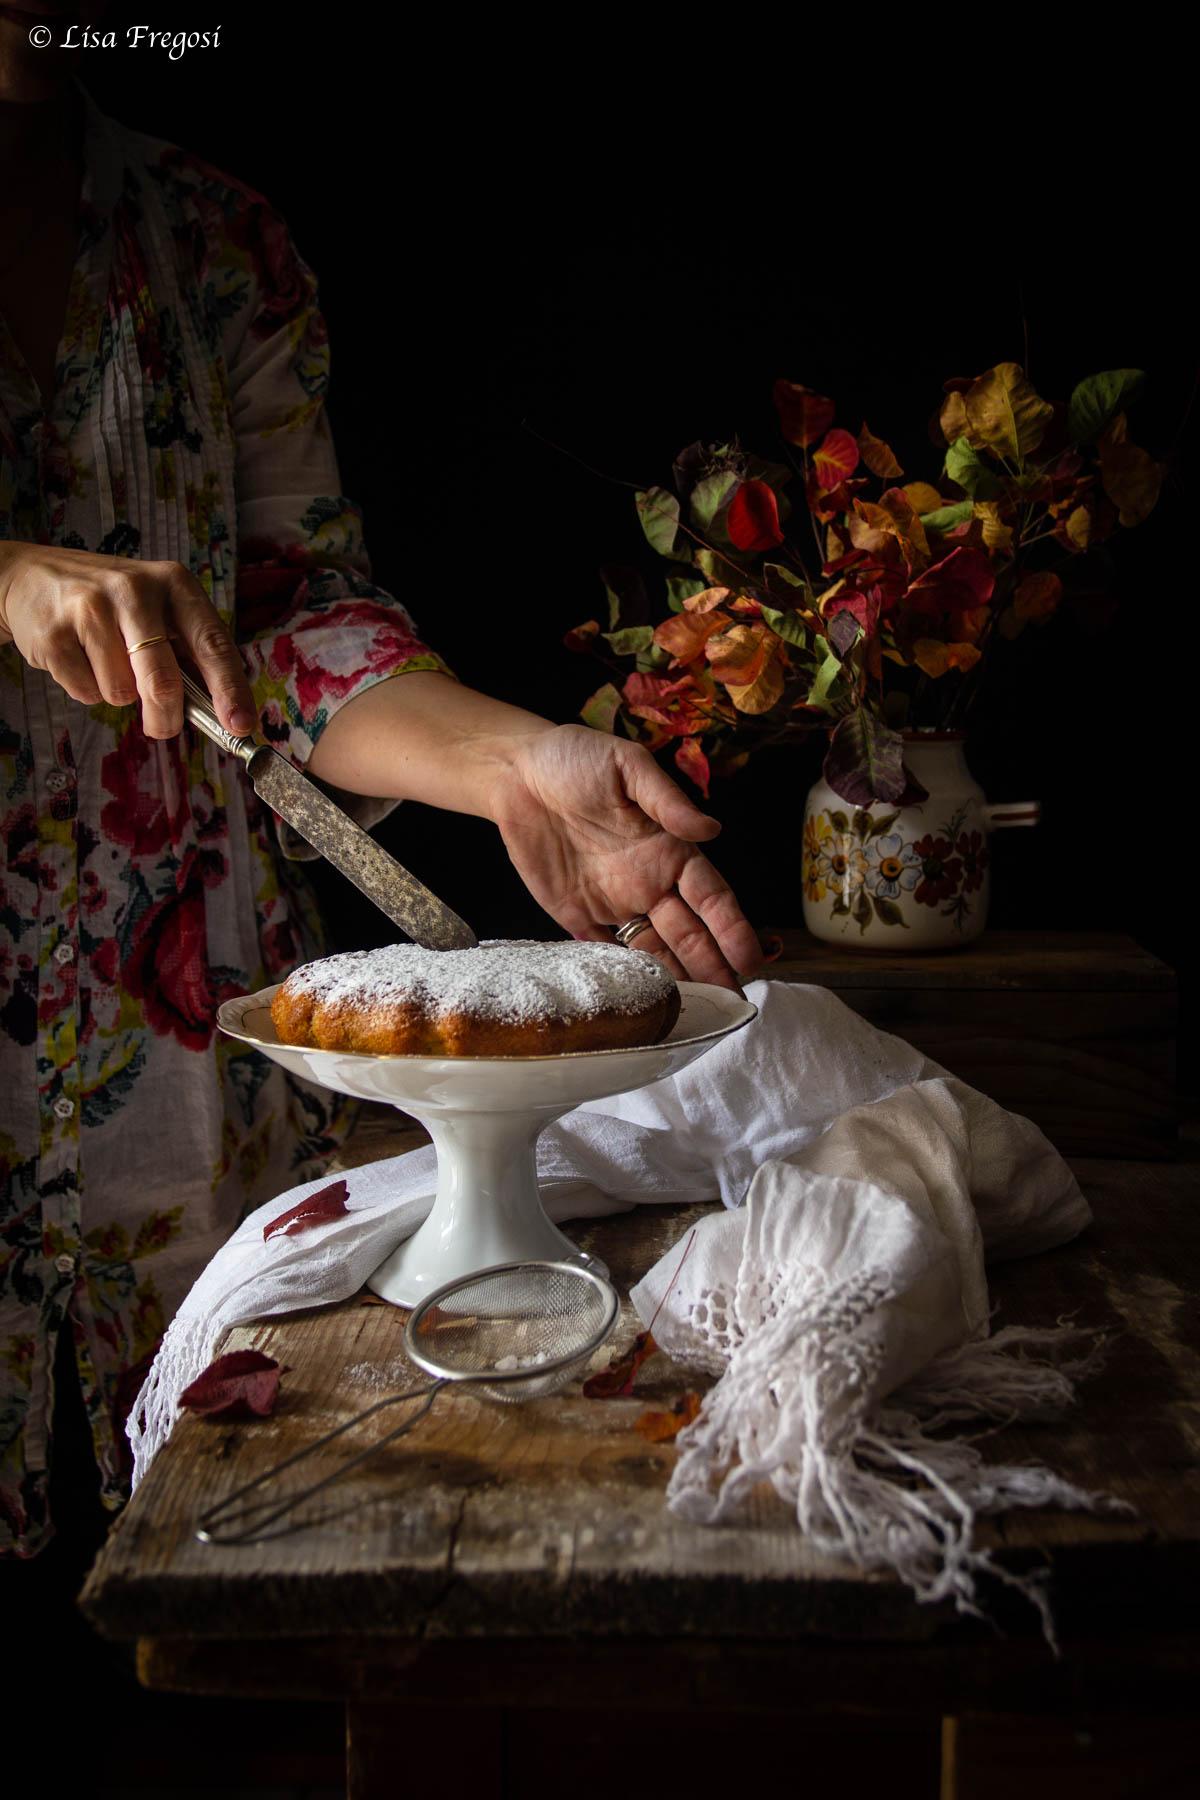 torta versata foto @fregosilisa photography